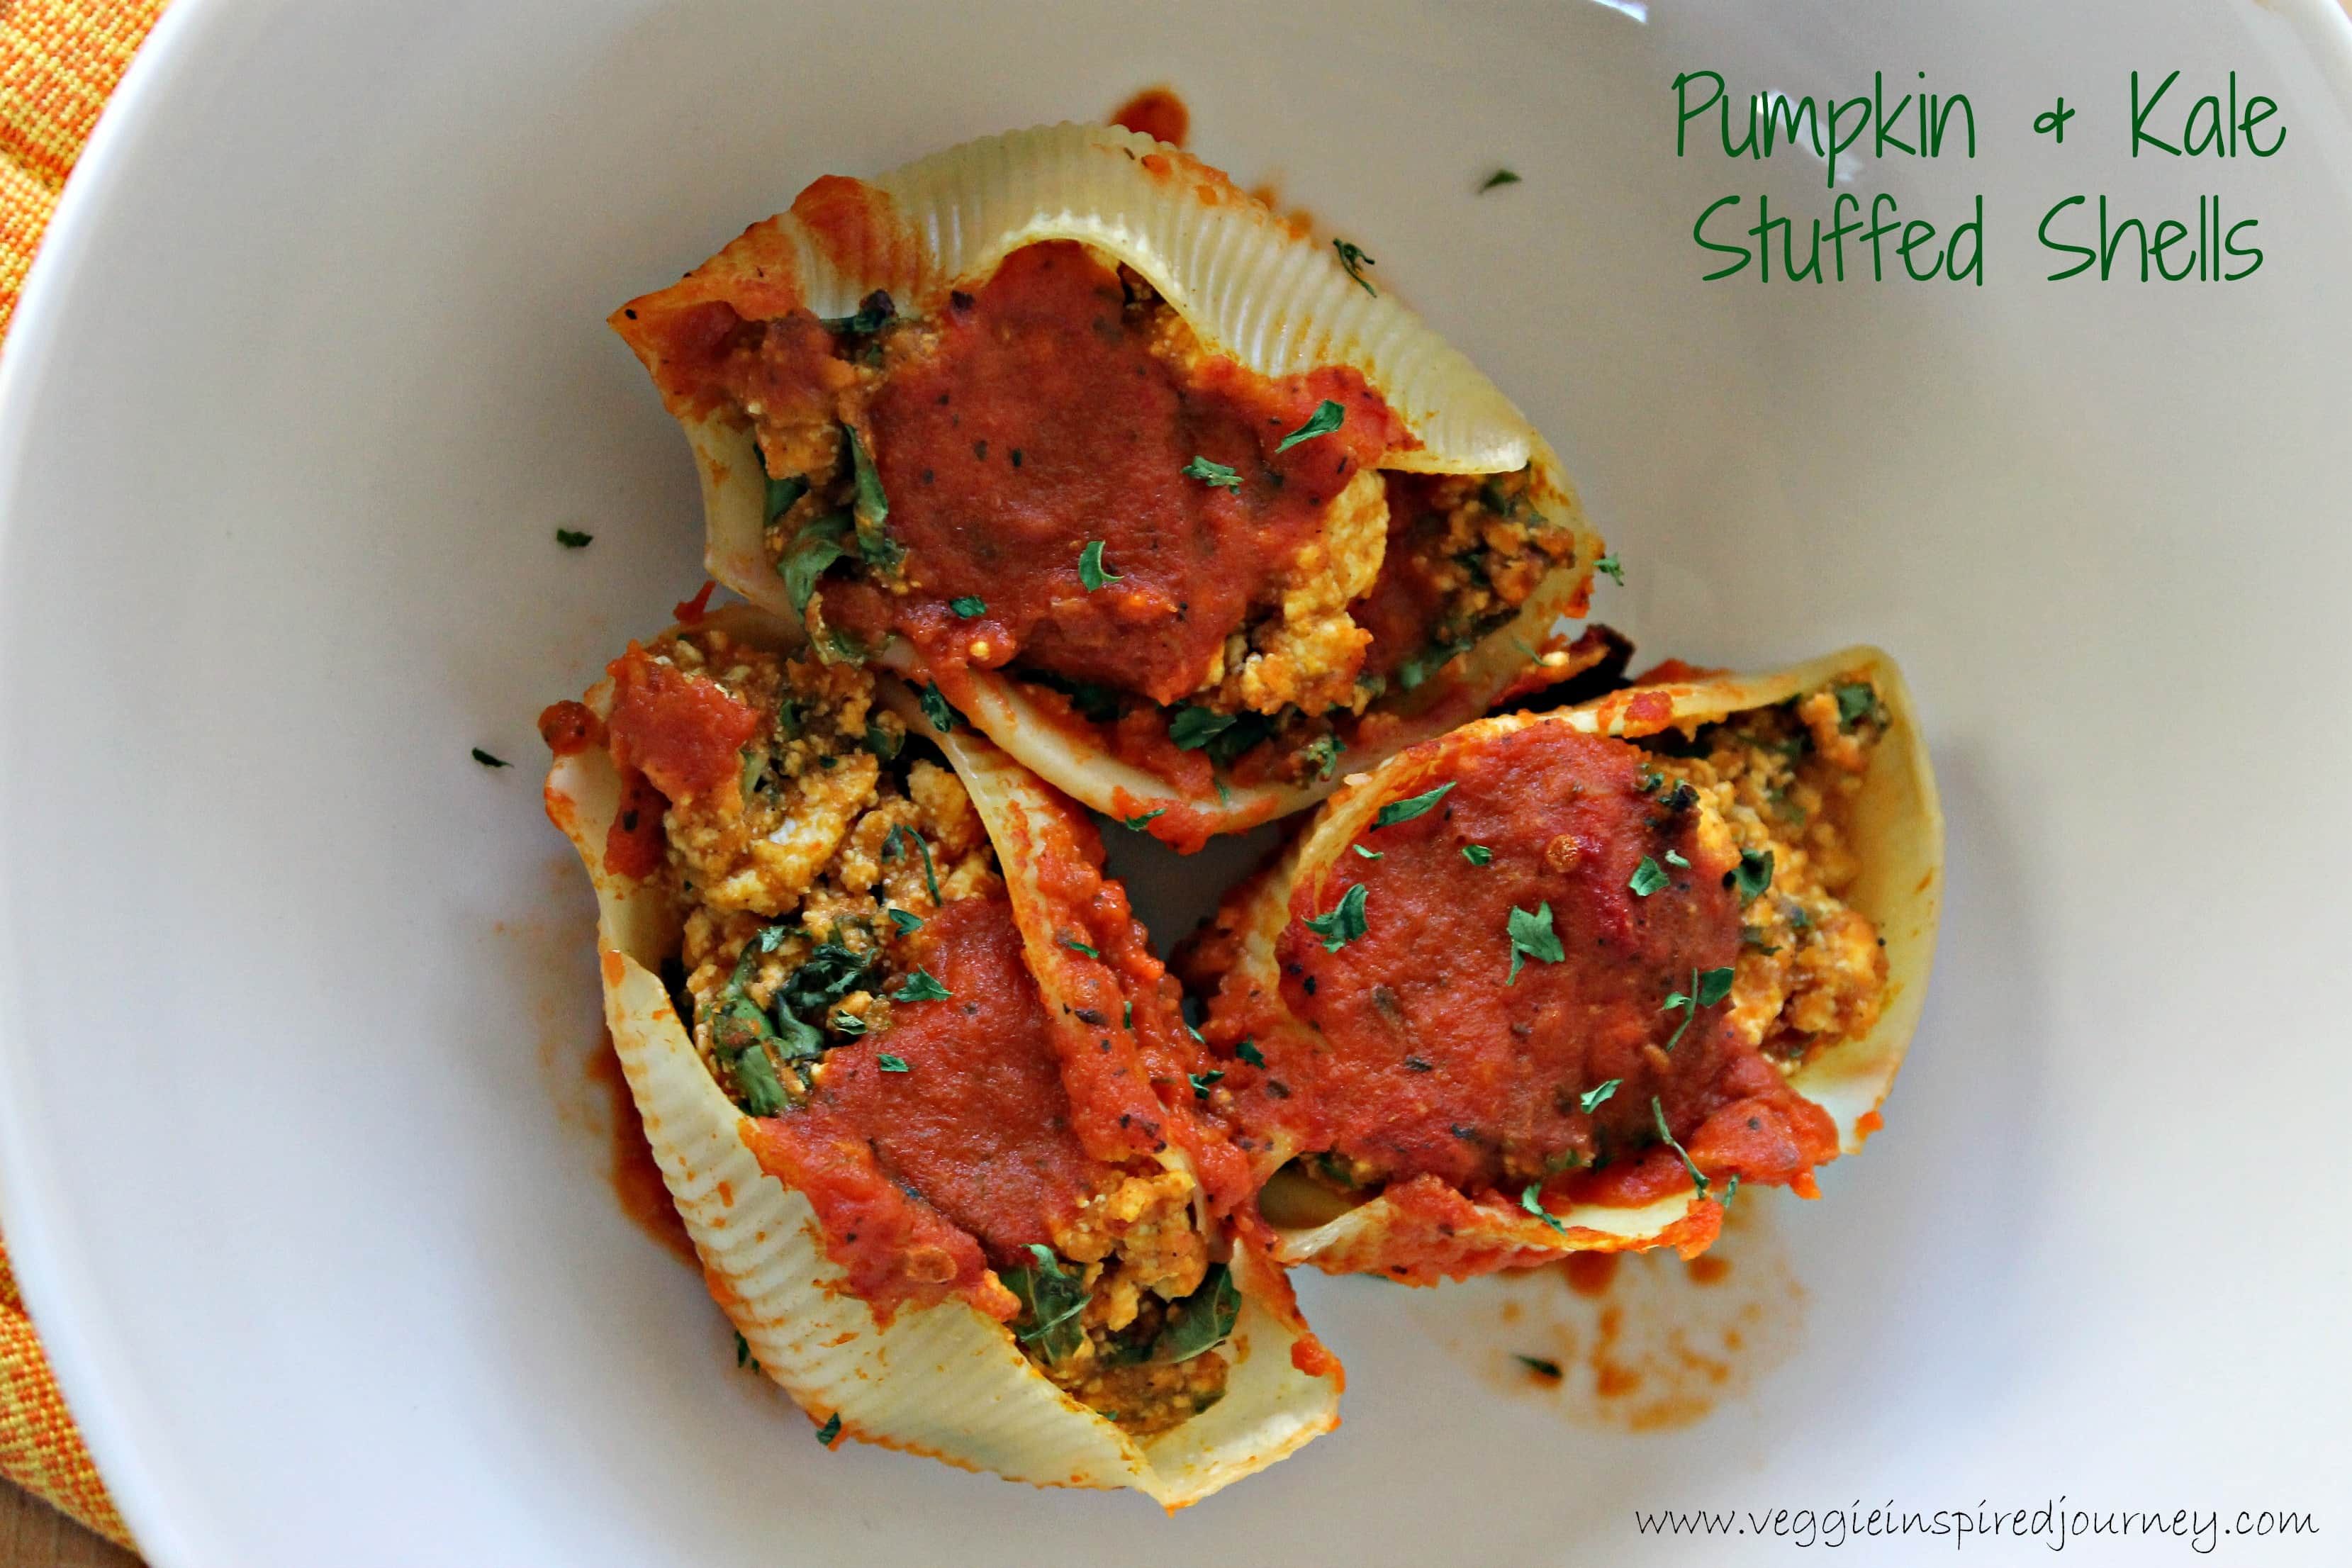 Pumpkin and Kale Stuffed Shells ~ Veggie Inspired